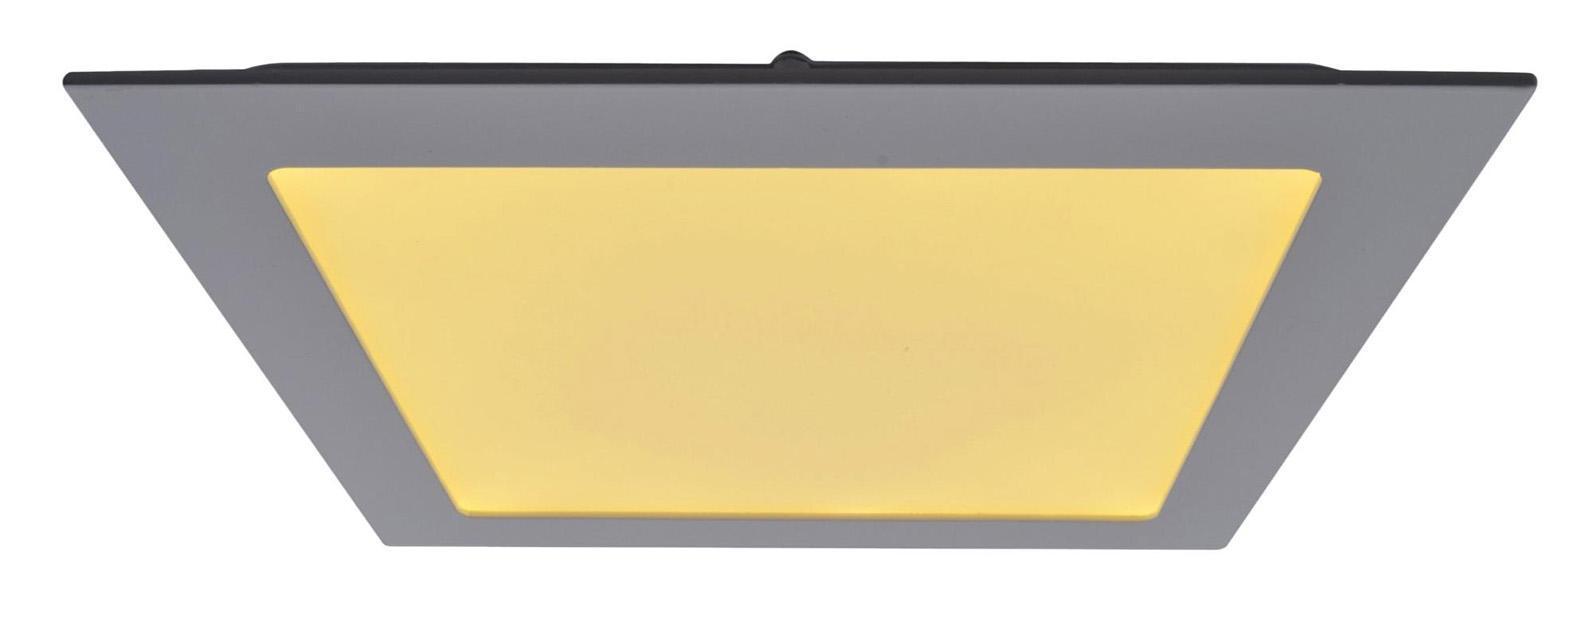 A2418PL-1WH FINE Встраиваемый светильникA2418PL-1WH18W LED; 1440 lm Материал: Арматура: Алюминий / Элемент декора: ПластикРазмер: 225x225x25Цвет: Белый